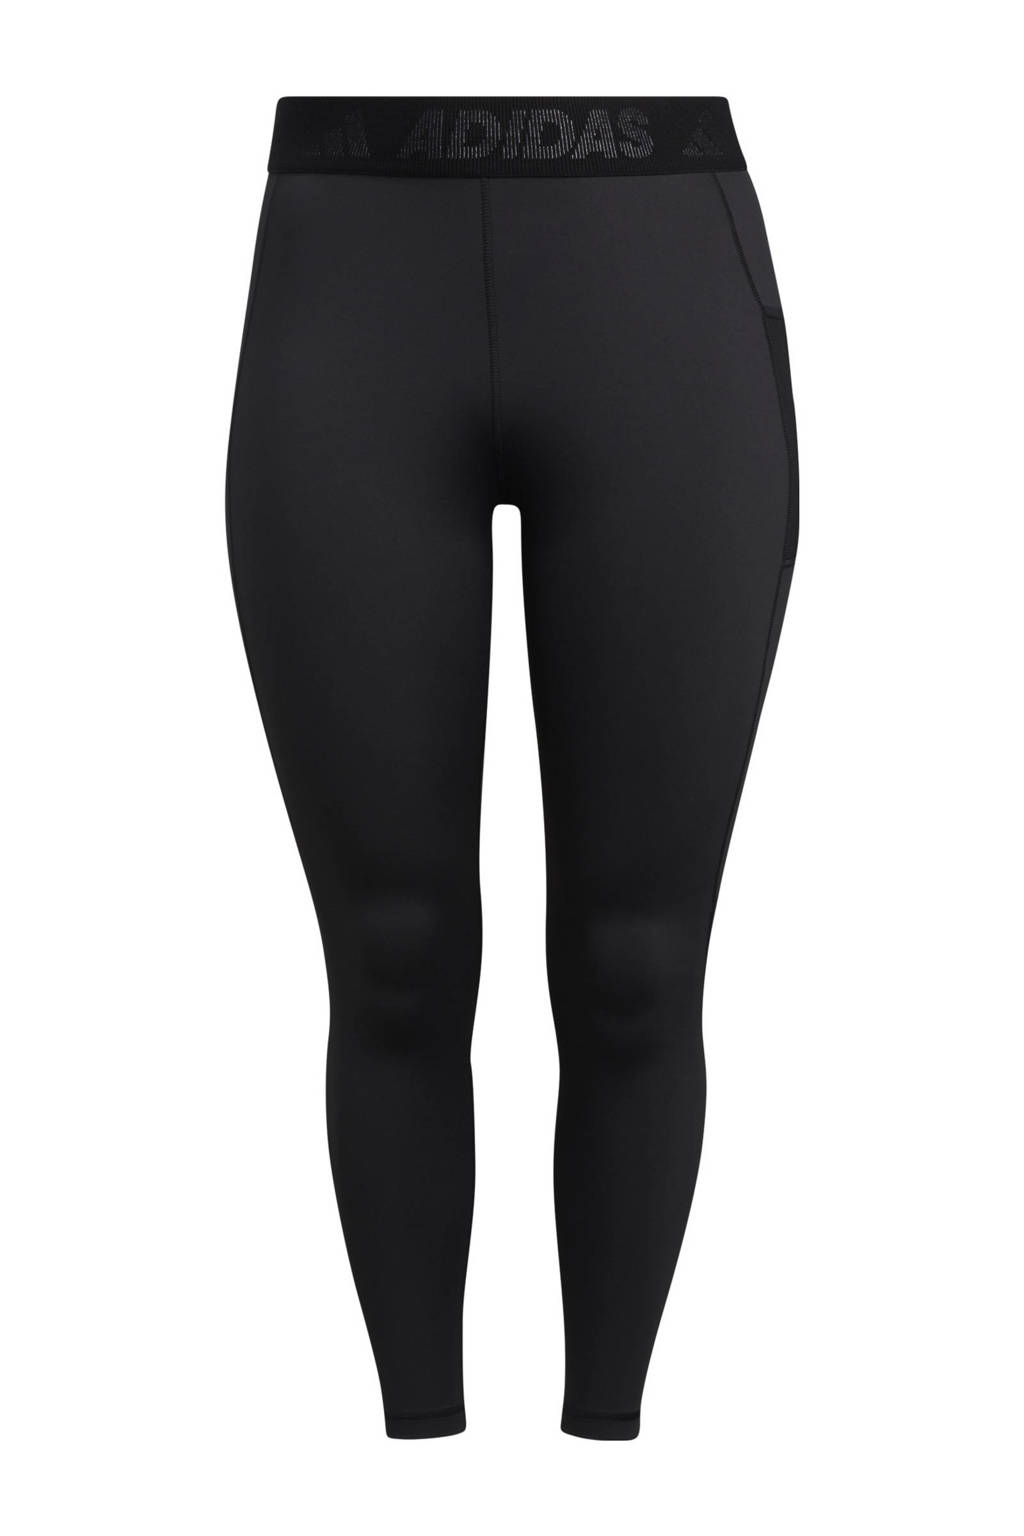 adidas Performance Plus Size sportlegging zwart/wit, Zwart/wit